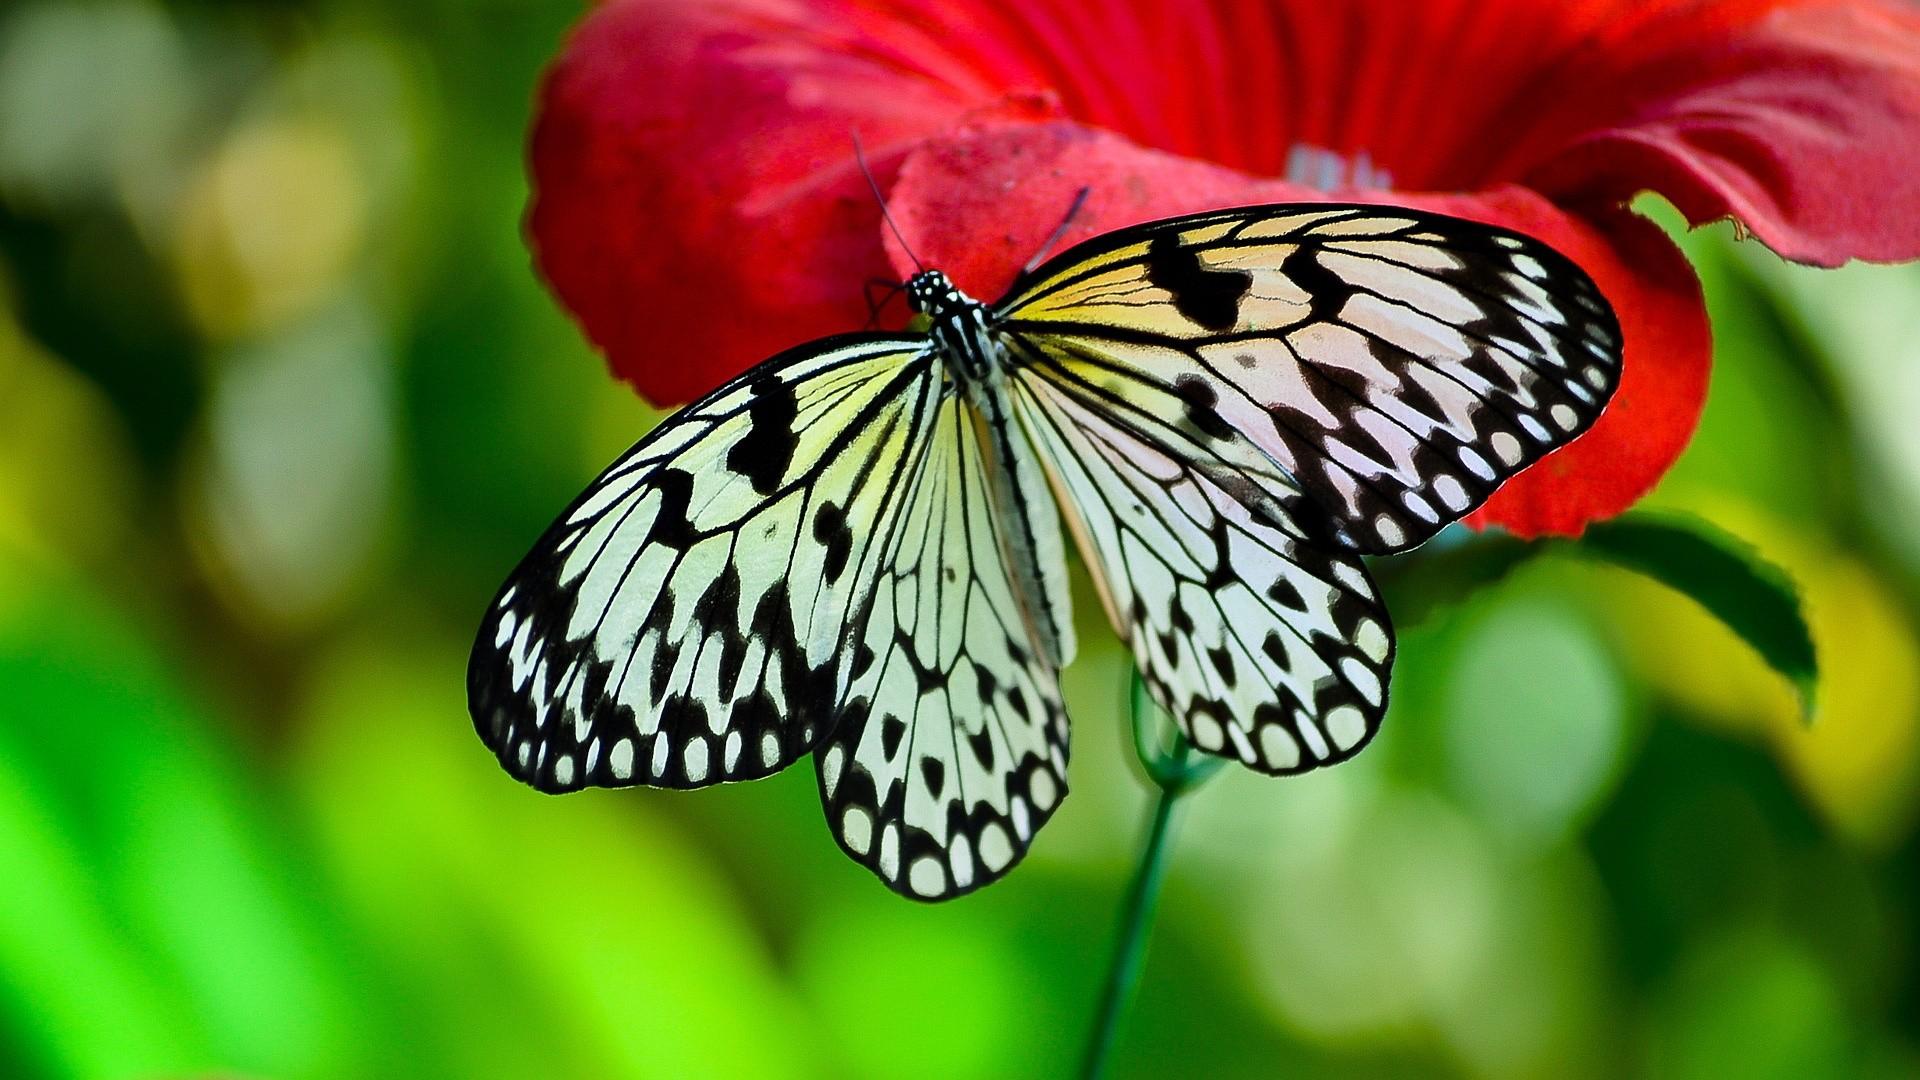 great butterfly wallpaper for walls hd u with butterfly wallpaper.